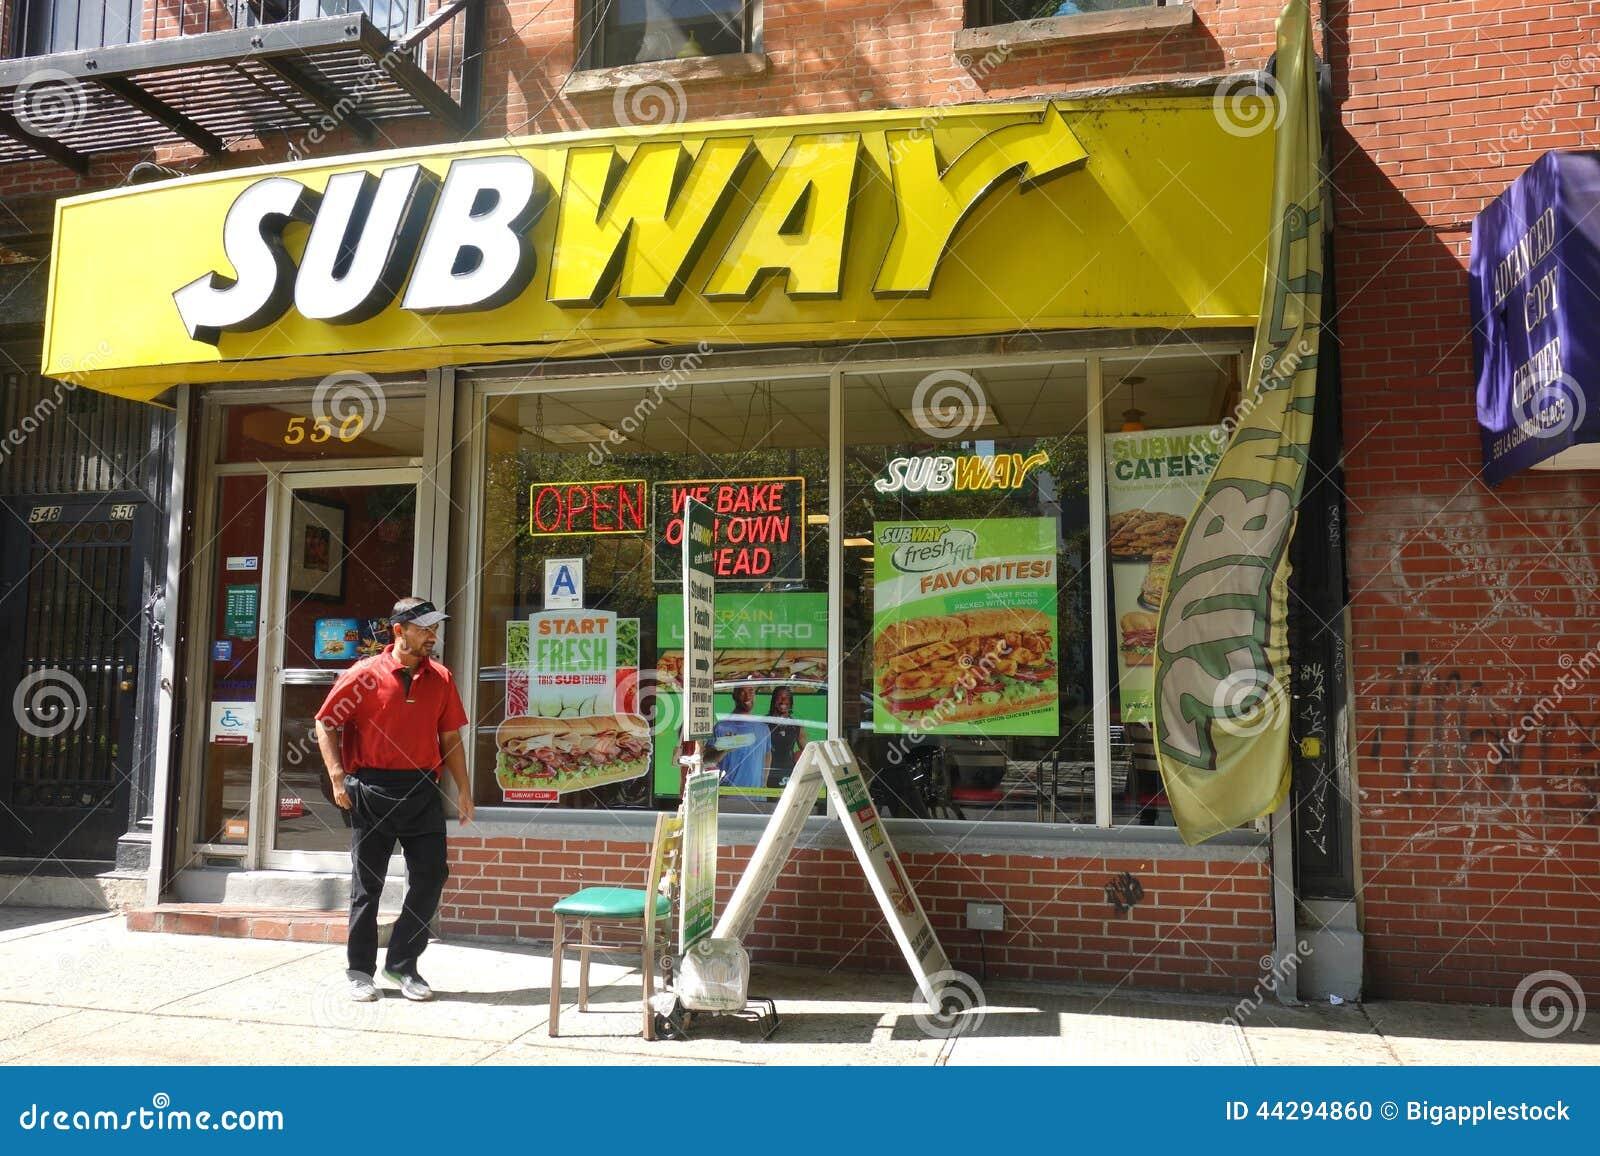 Downtown Subway Restaurant